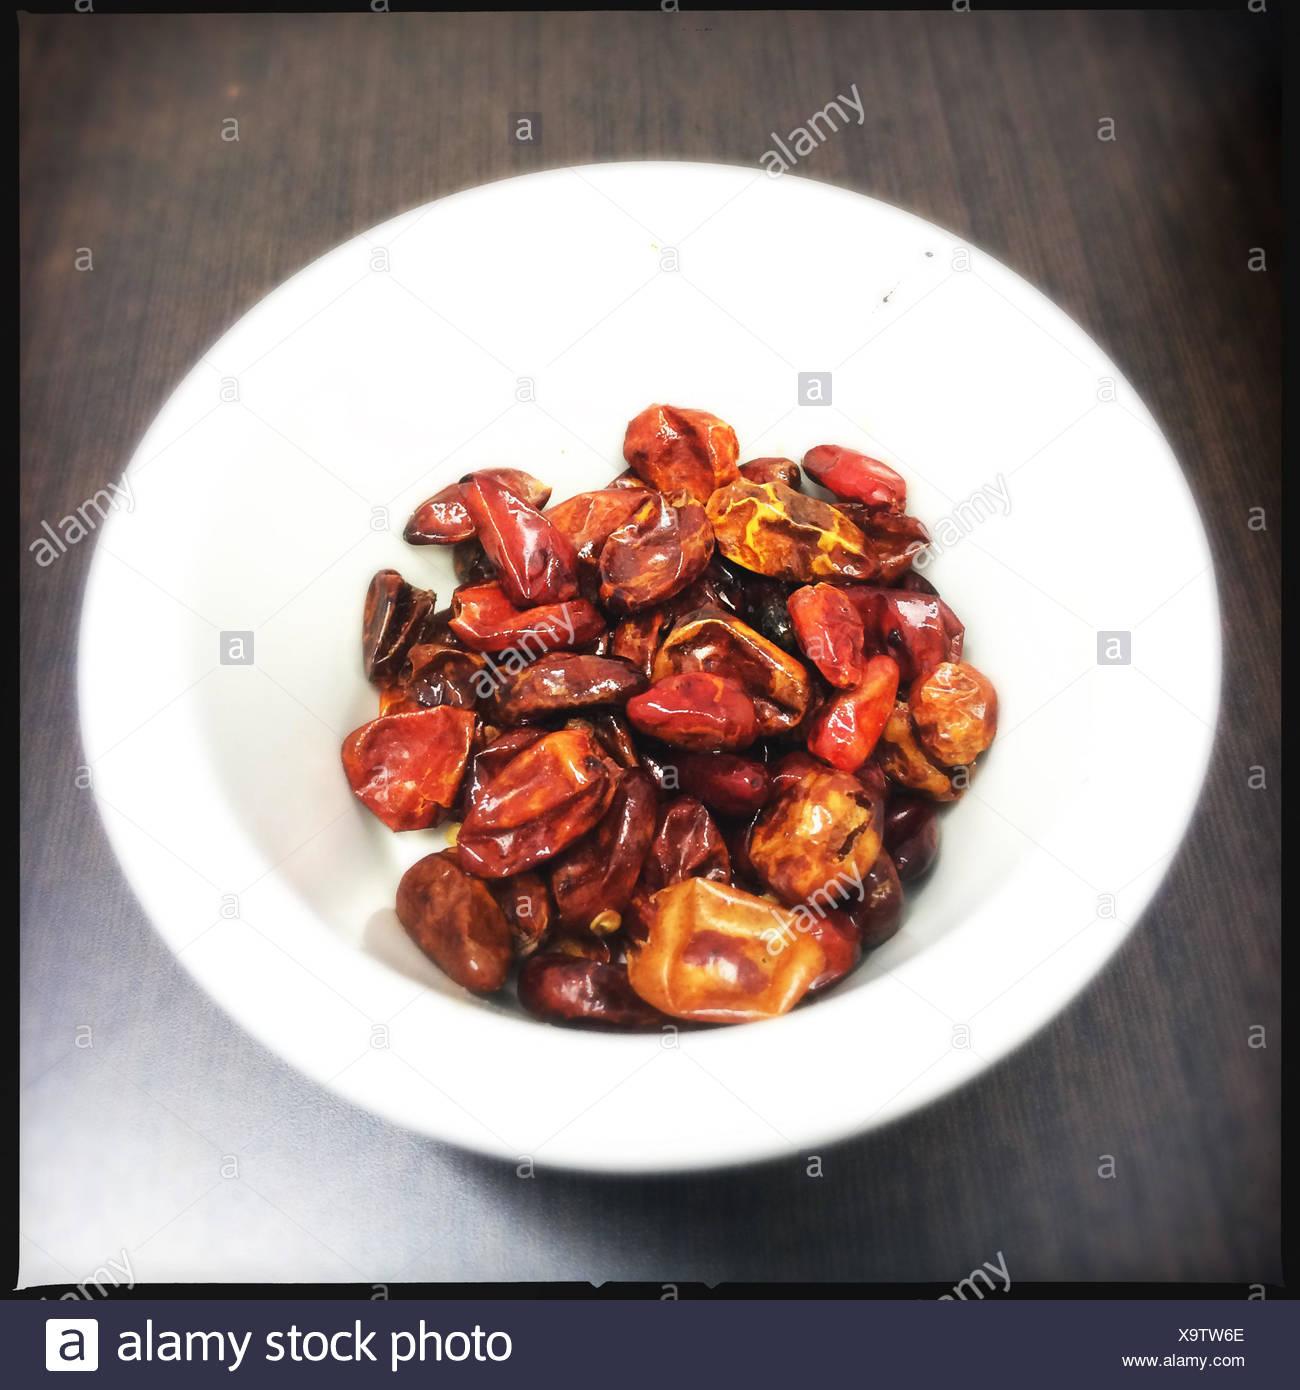 Mexico, Chiapas, Simojovel chili peppers - Stock Image